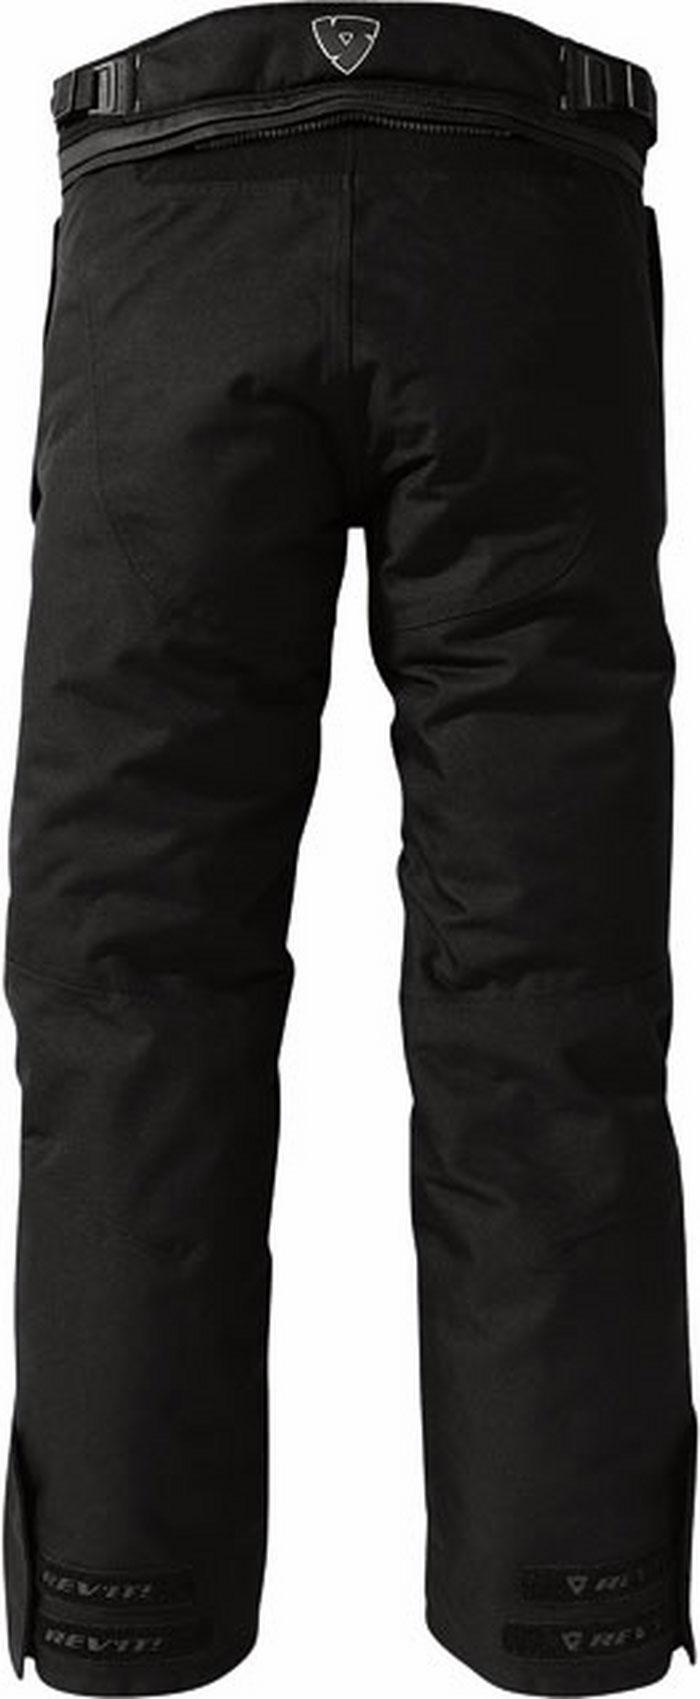 Rev'it Horizon motorcycle trousers black